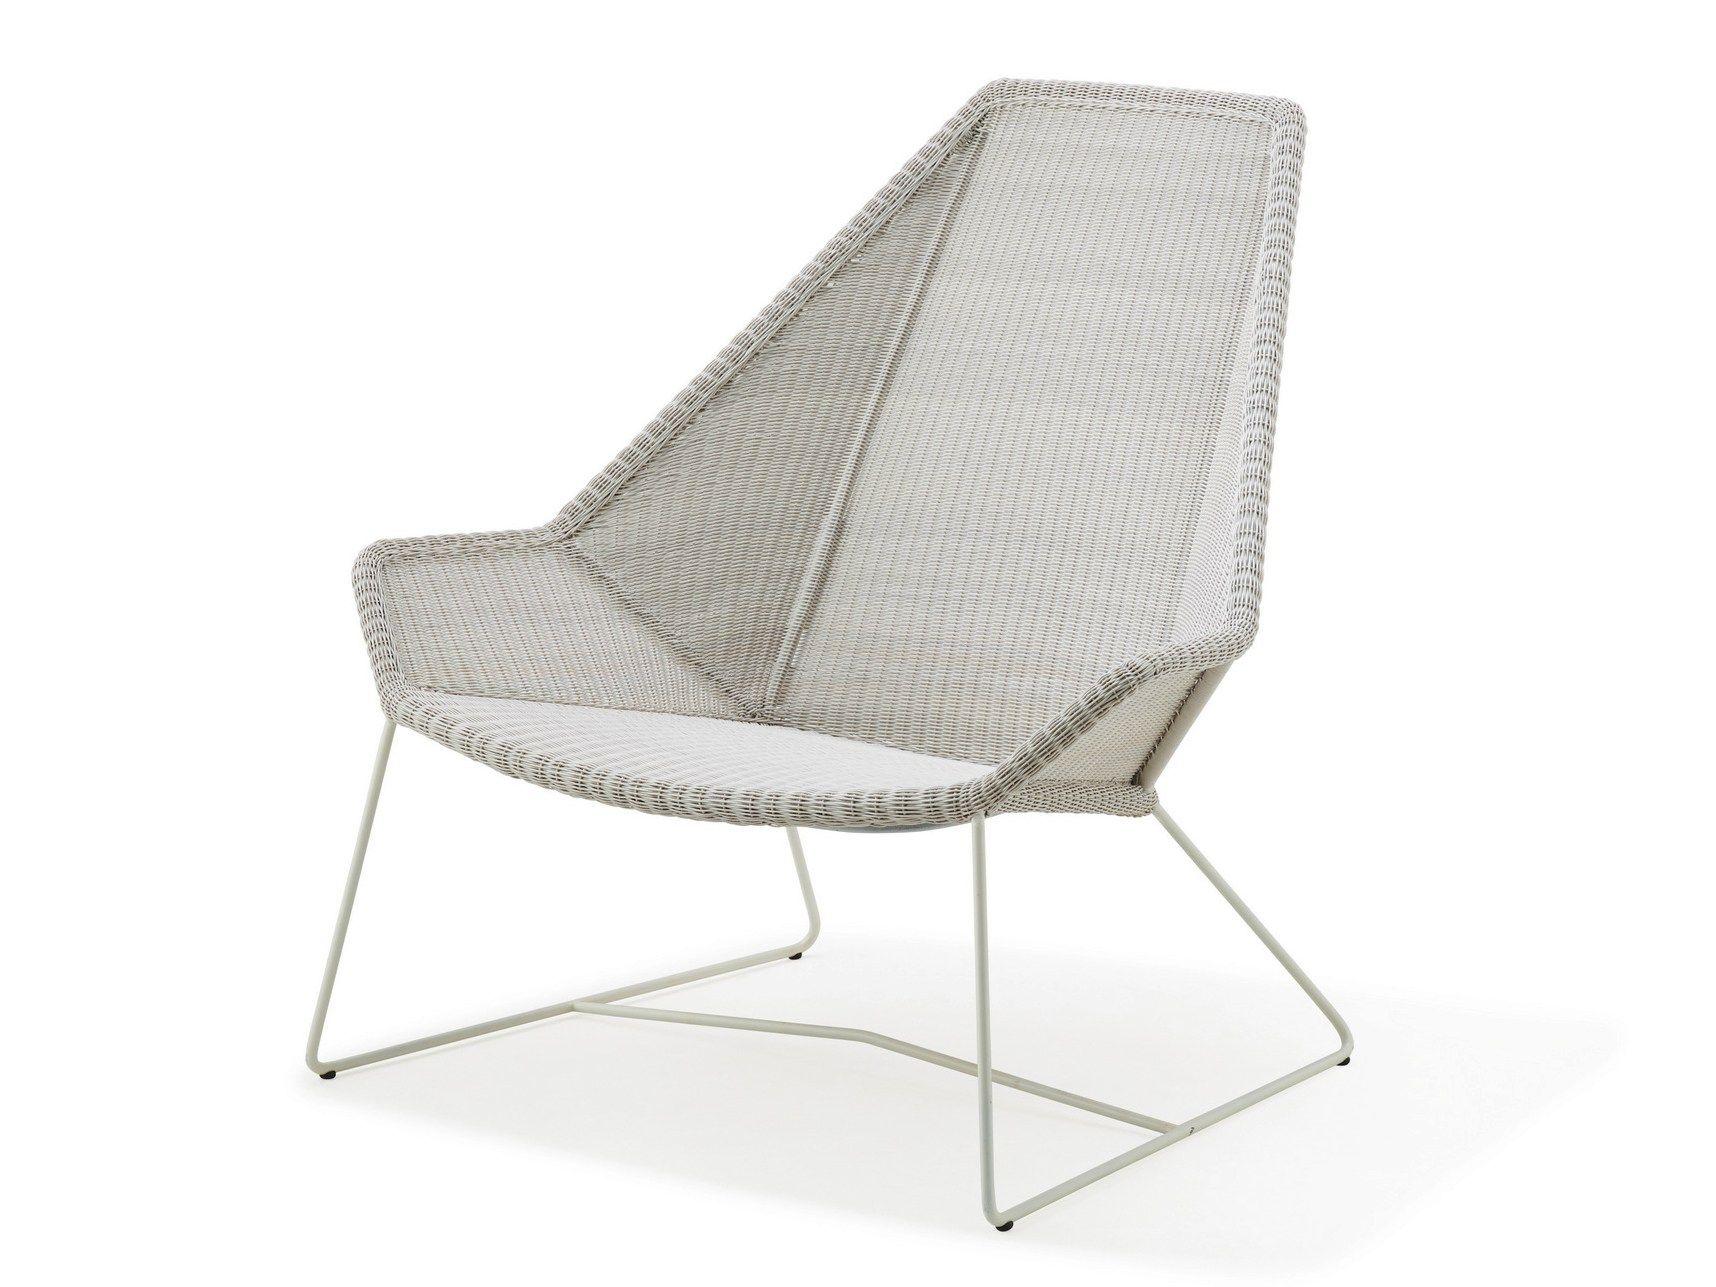 BREEZE Garden armchair by Cane-line design Strand Hvass | I ...